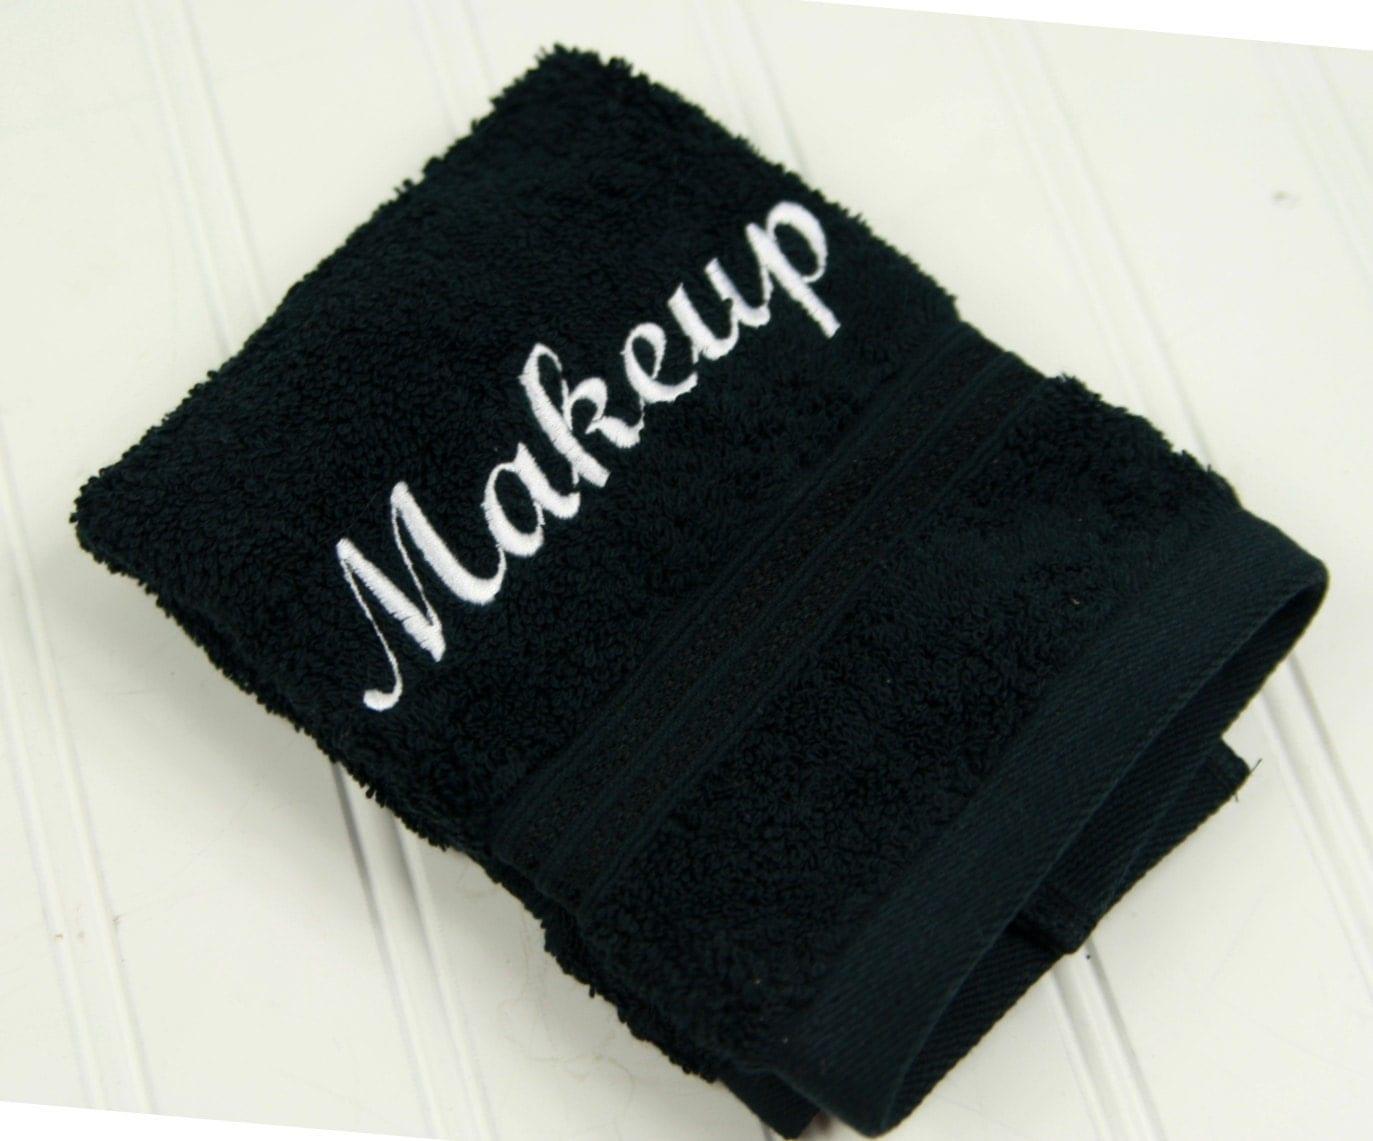 Black Makeup Towel Makeup Washcloth Beach House Gift